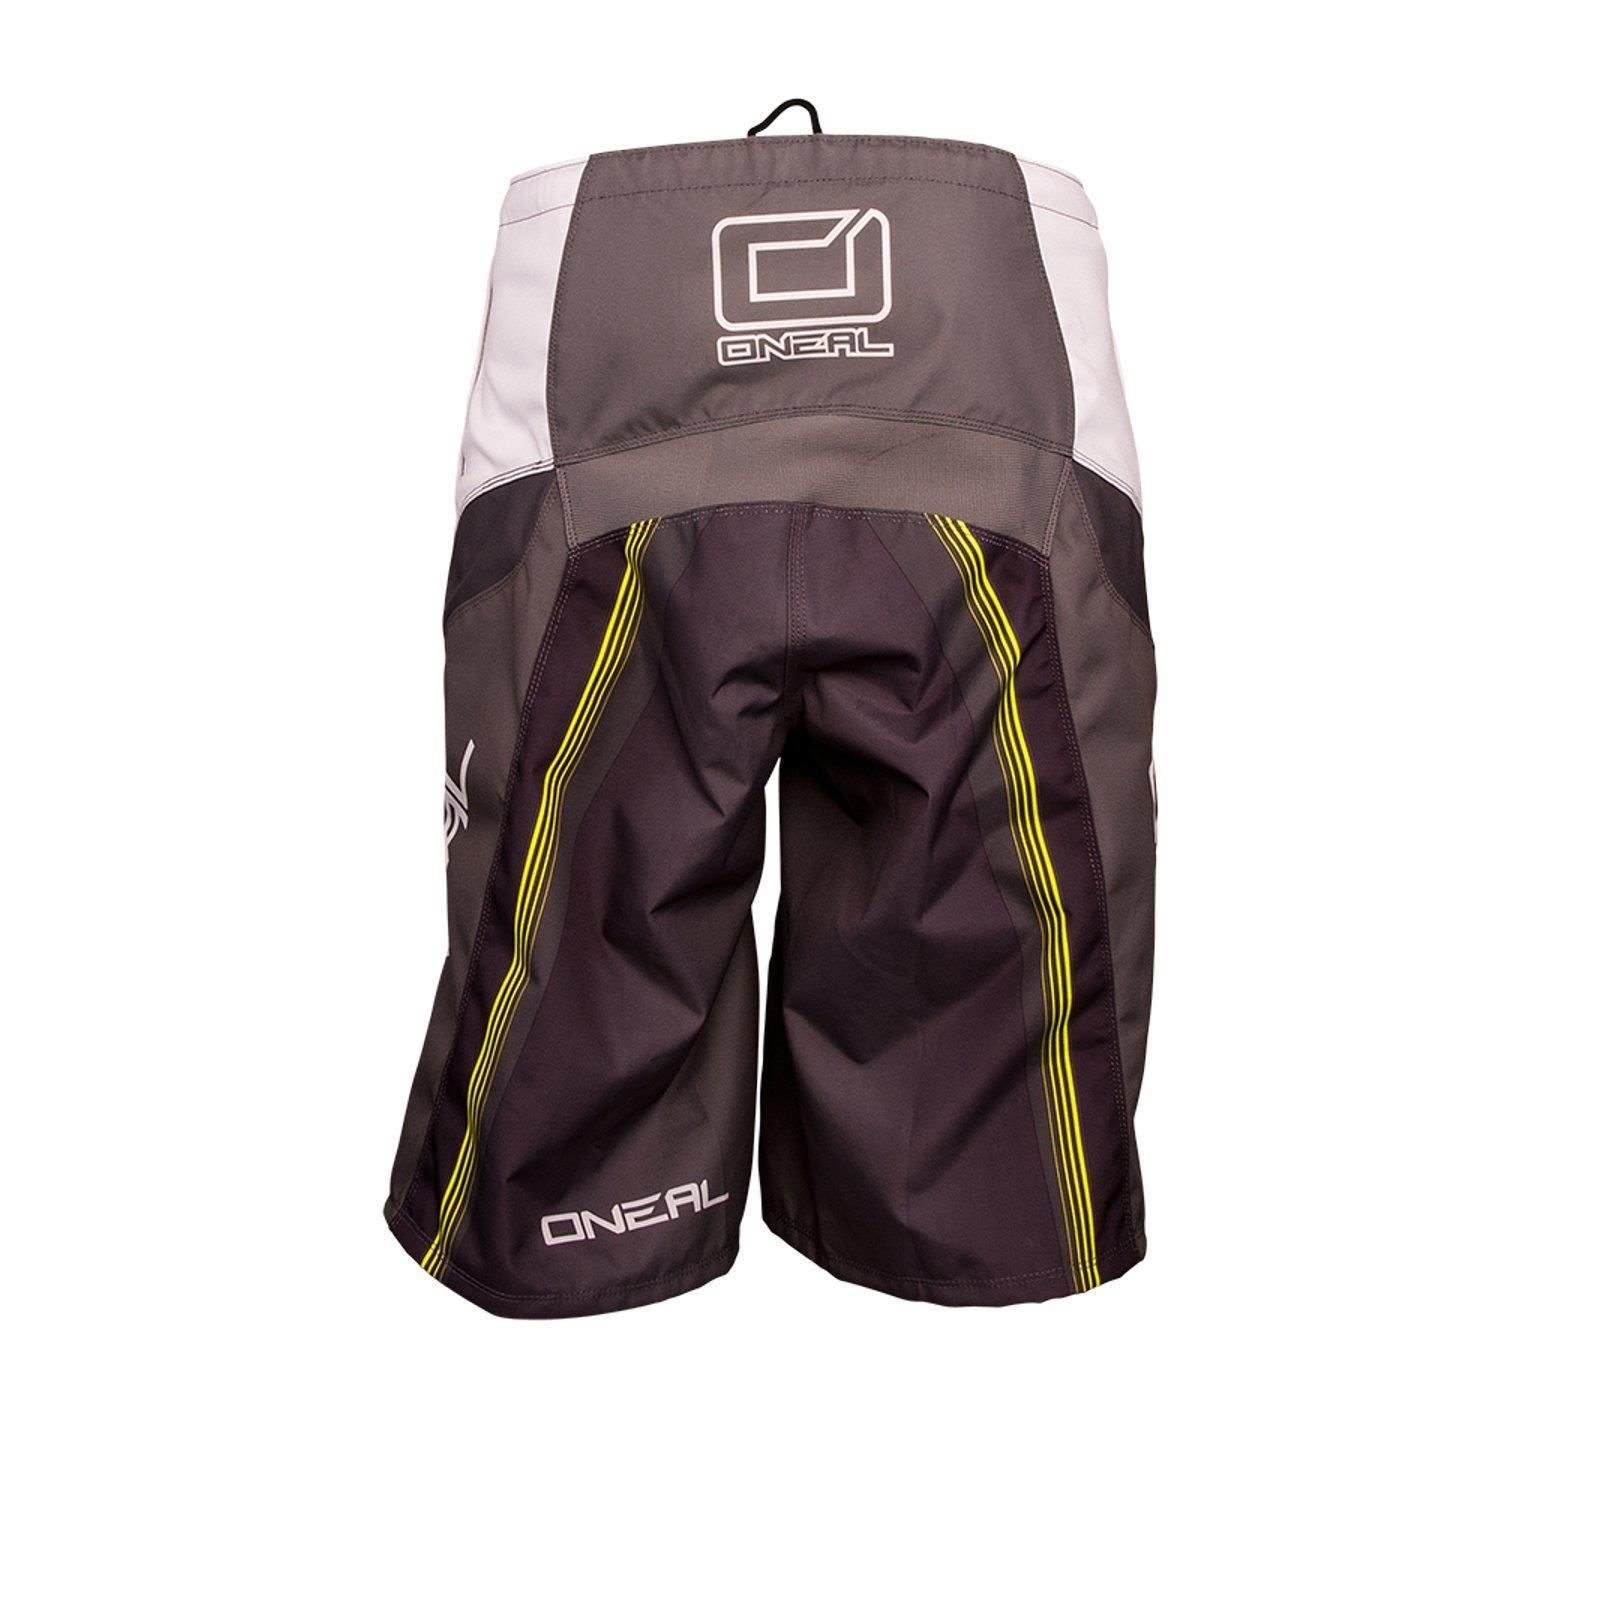 ONEAL-Element-FR-Short-Giallo-MTB-DH-MX-CROSS-SHORTS-PANTALONI-Downhill-Mountain-Bike-FR miniatura 10